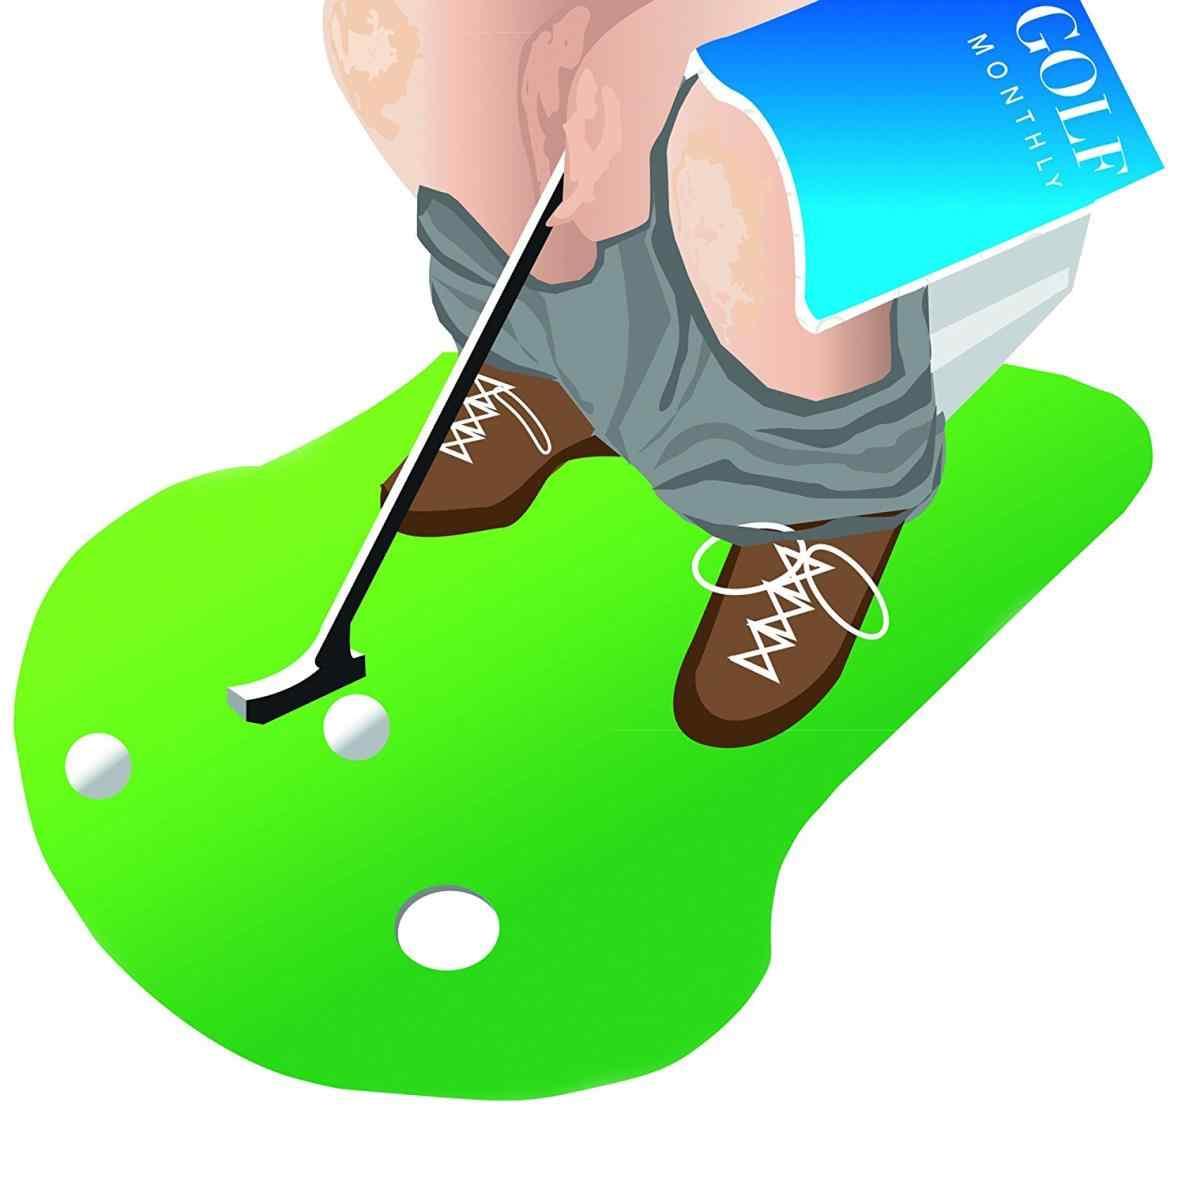 1185x1185 Golf Borisimage.club